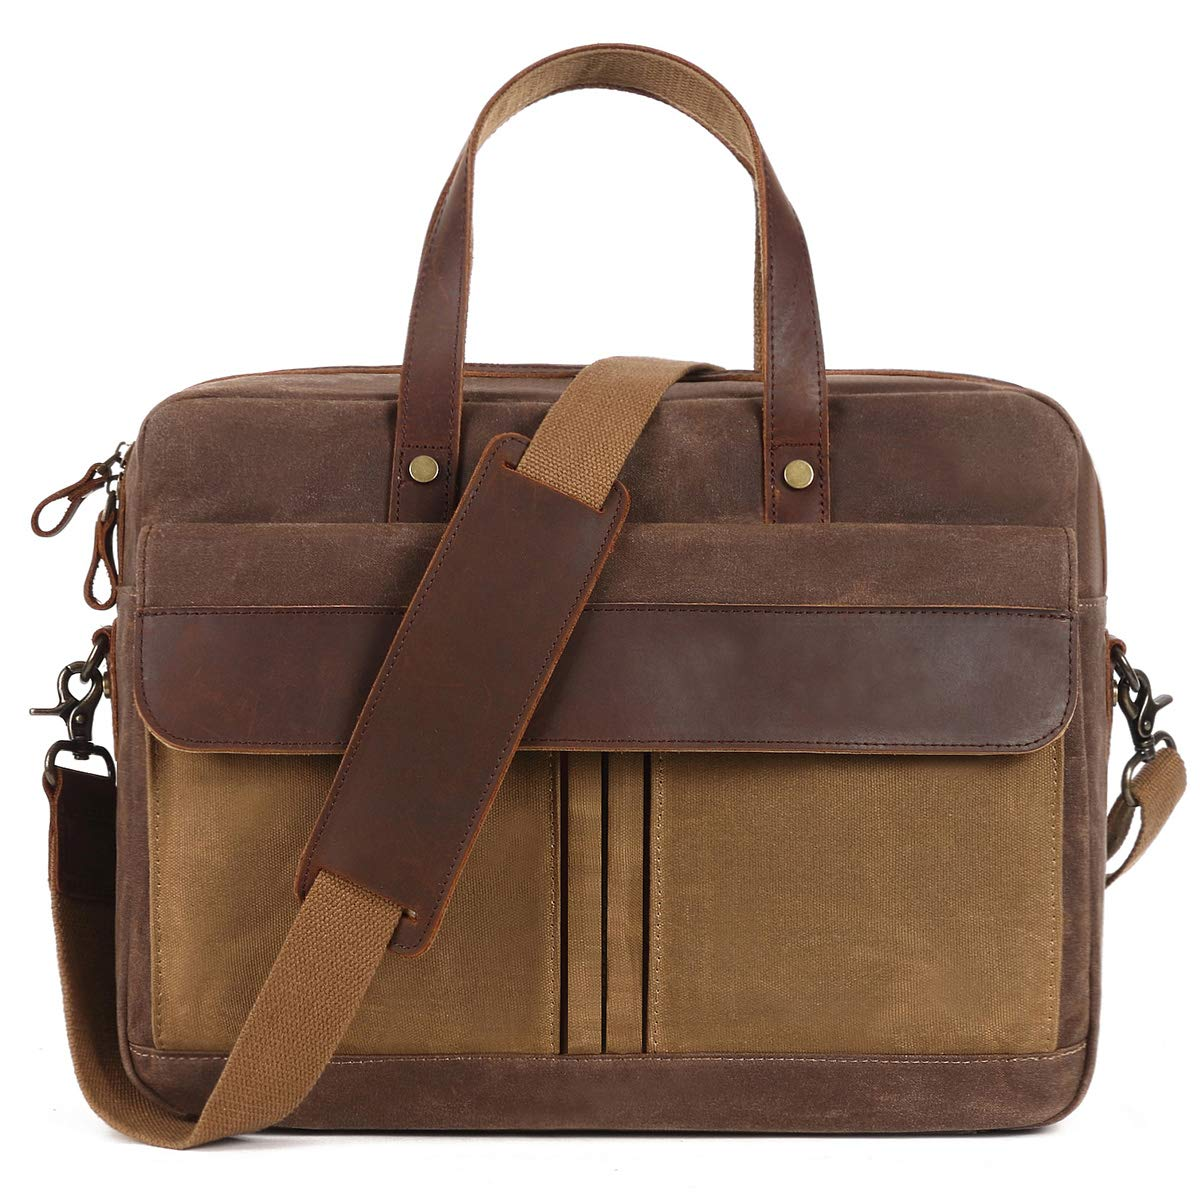 Briefcase for Men,Messenger Bag for Men,15.6inch Laptop Lugagge Carry On Tote,Canvass Computer Large Satchel Shoulder Bags,Vintage Leather Handbag Waterproof for Travel Brown